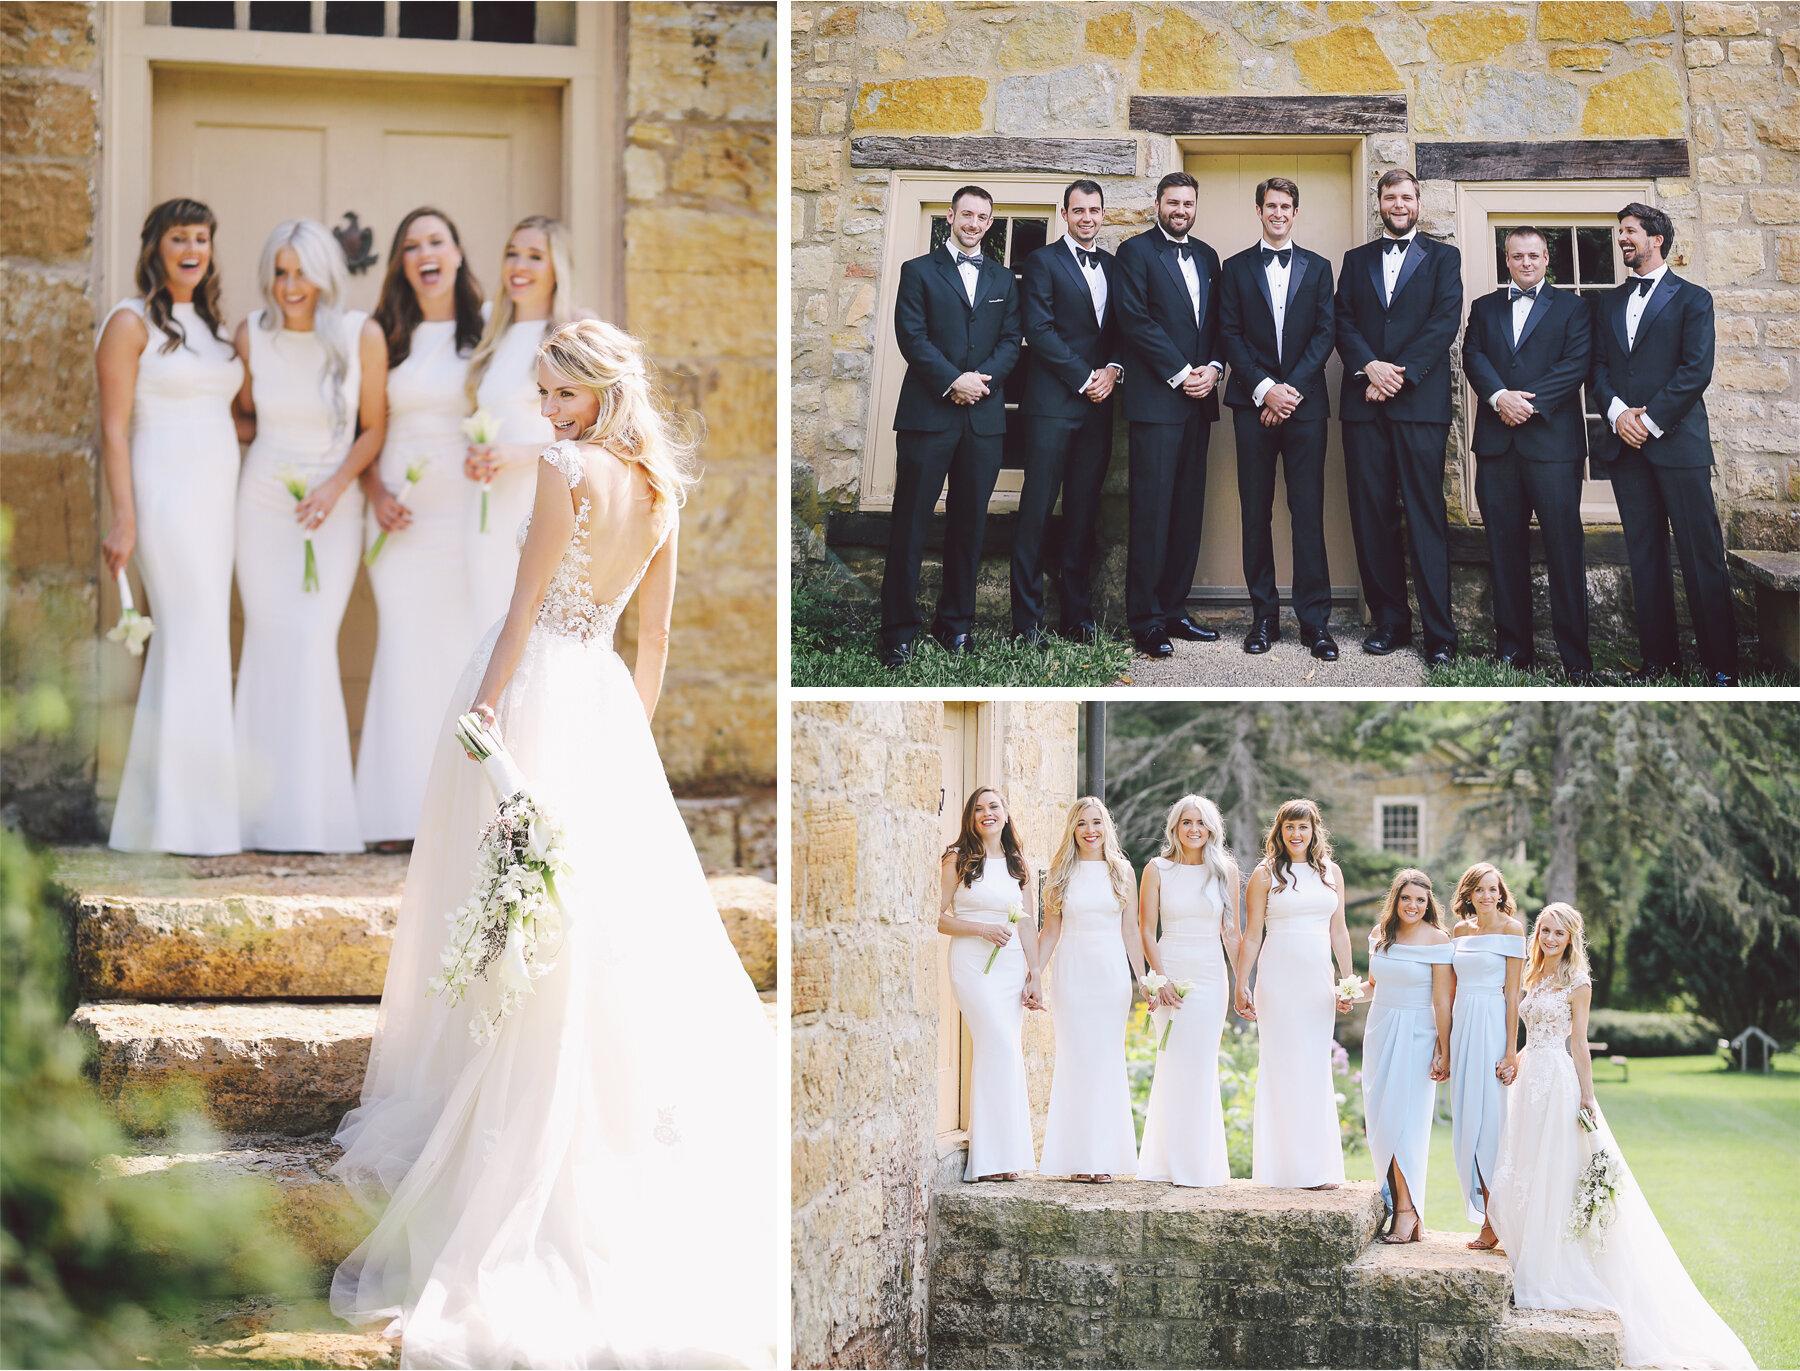 09 Wedding Vick Photography Minneapolis Minnesota Bride Groom Bridesmaids Groomsmen Michelle and William.jpg